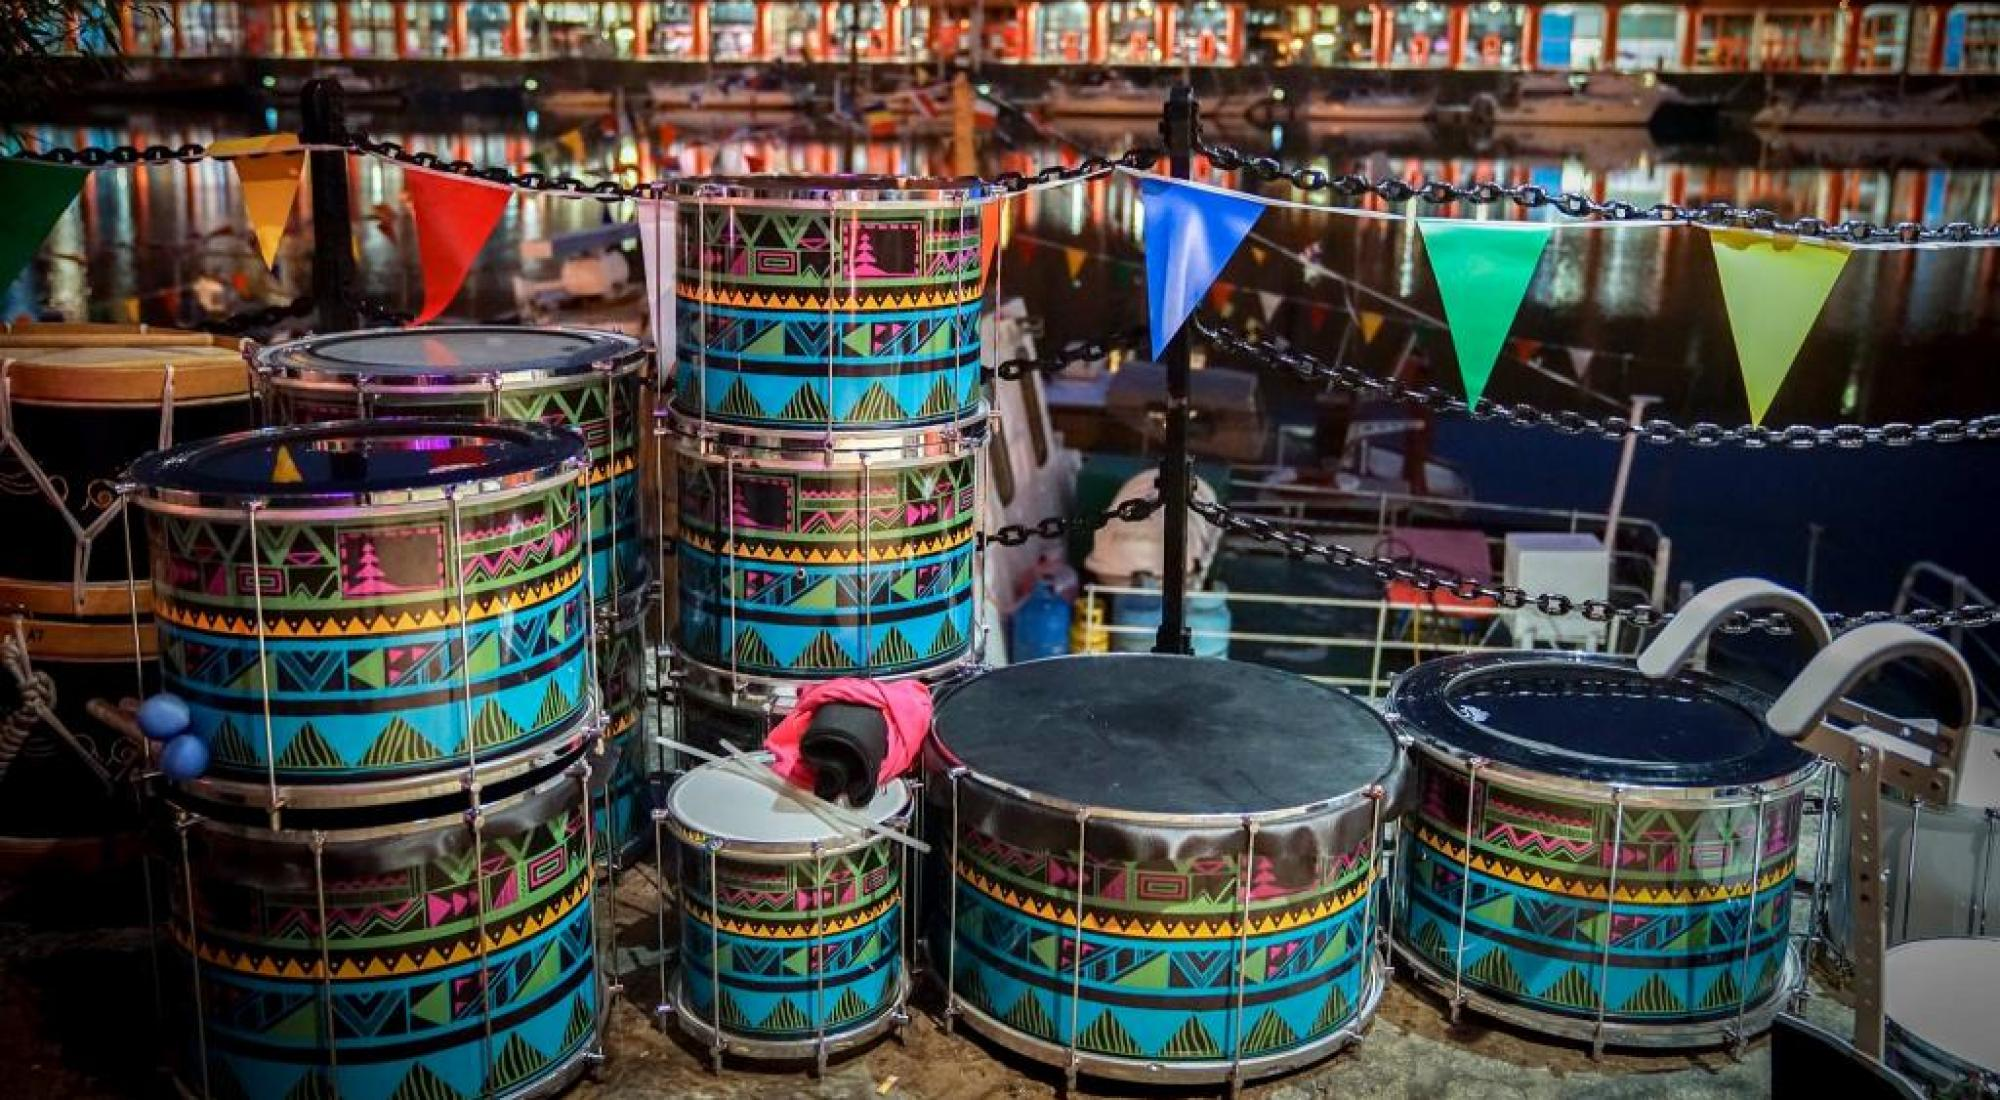 drums bunting amsterdam night